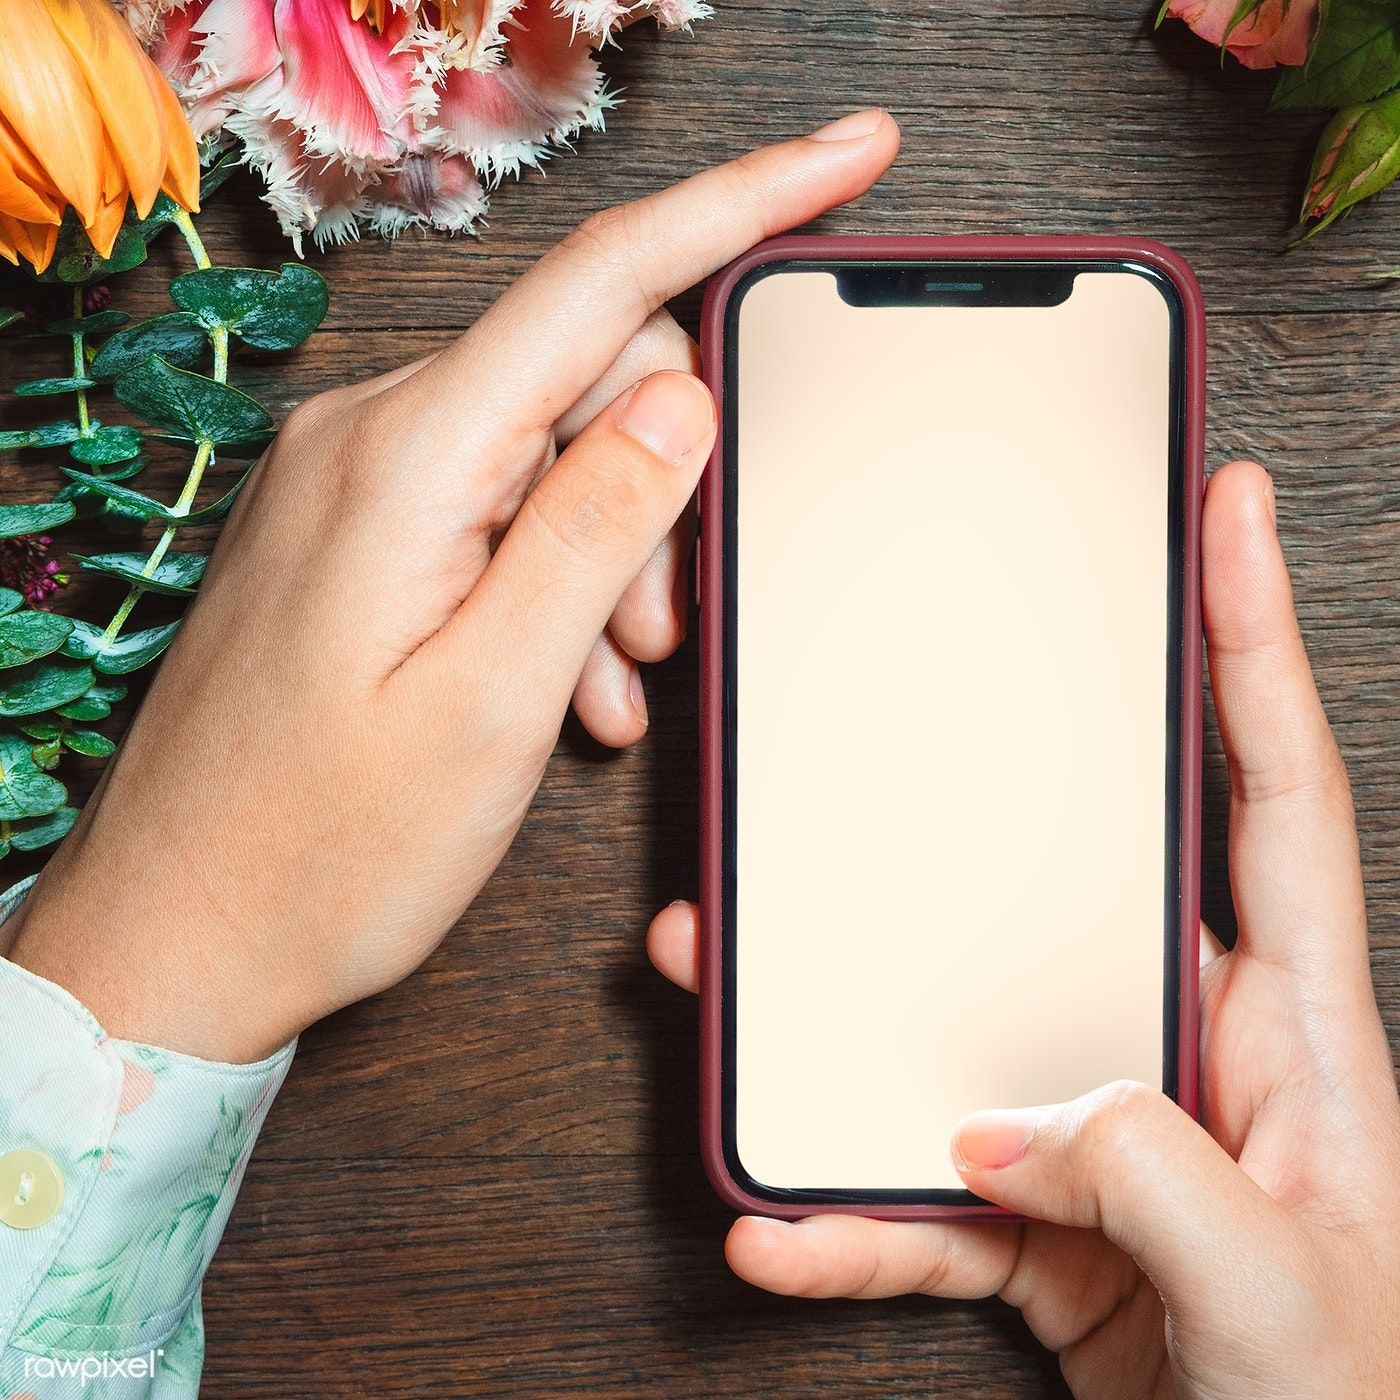 Download Premium Psd Of Woman Holding A Mobile Screen Mockup 1212366 Ideias Para Cartaz Ideias Instagram Molduras Para Fotos Montagens